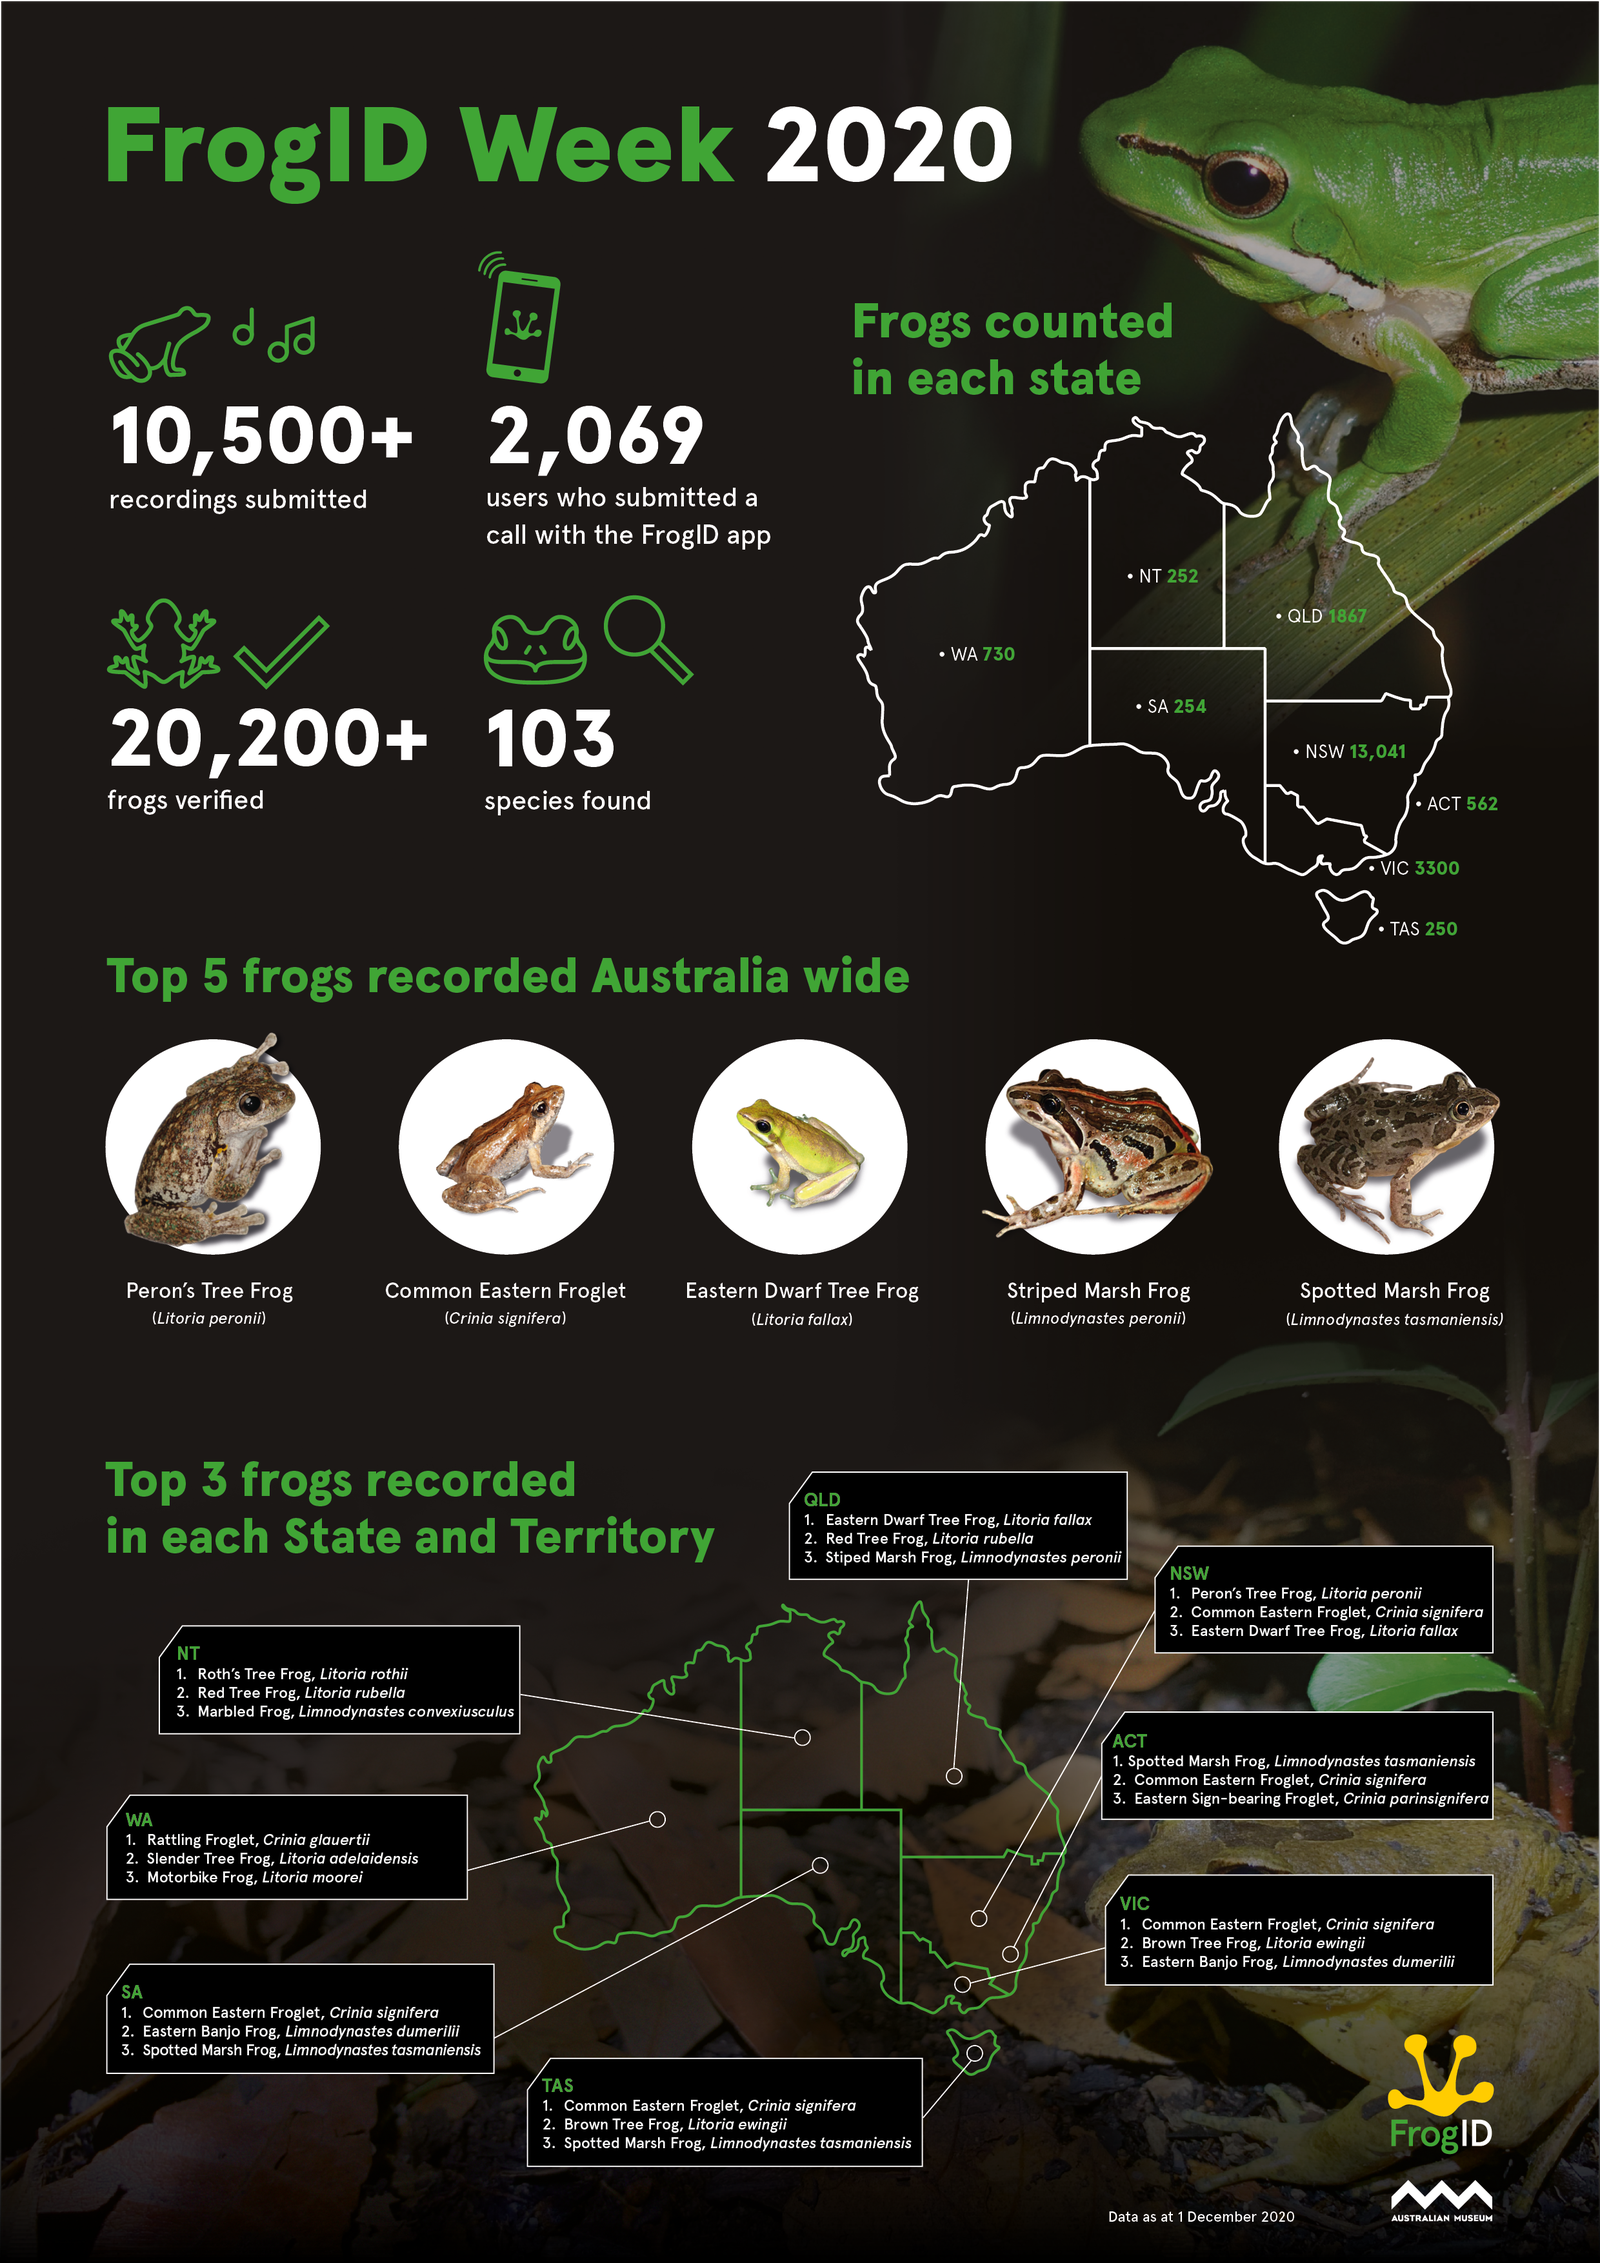 FrogID Week 2020